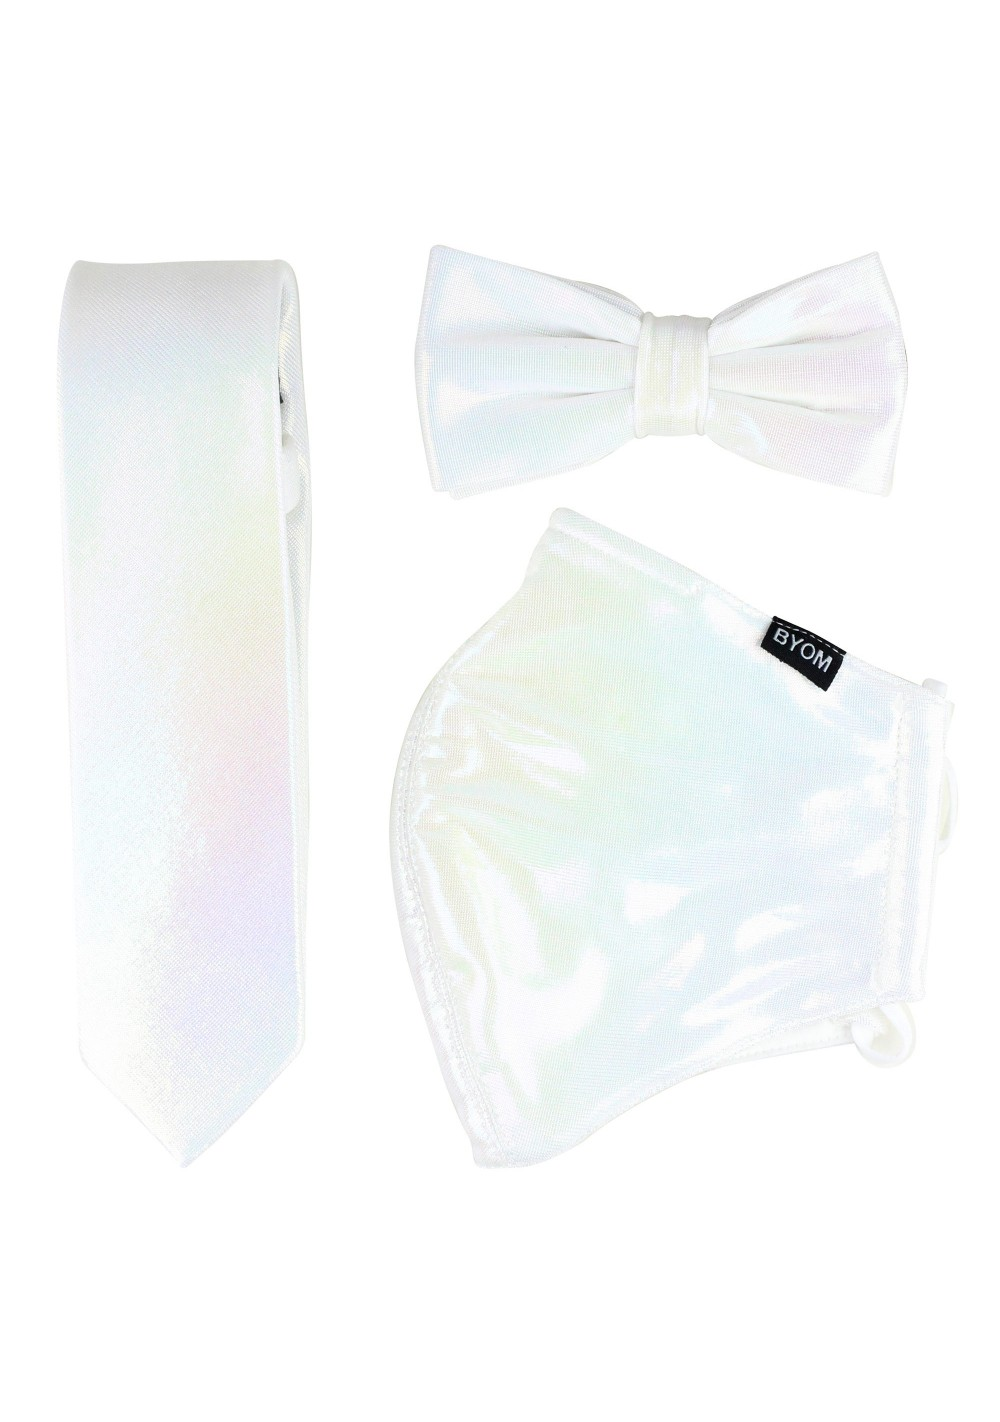 White Glitter Mask and Tie Set